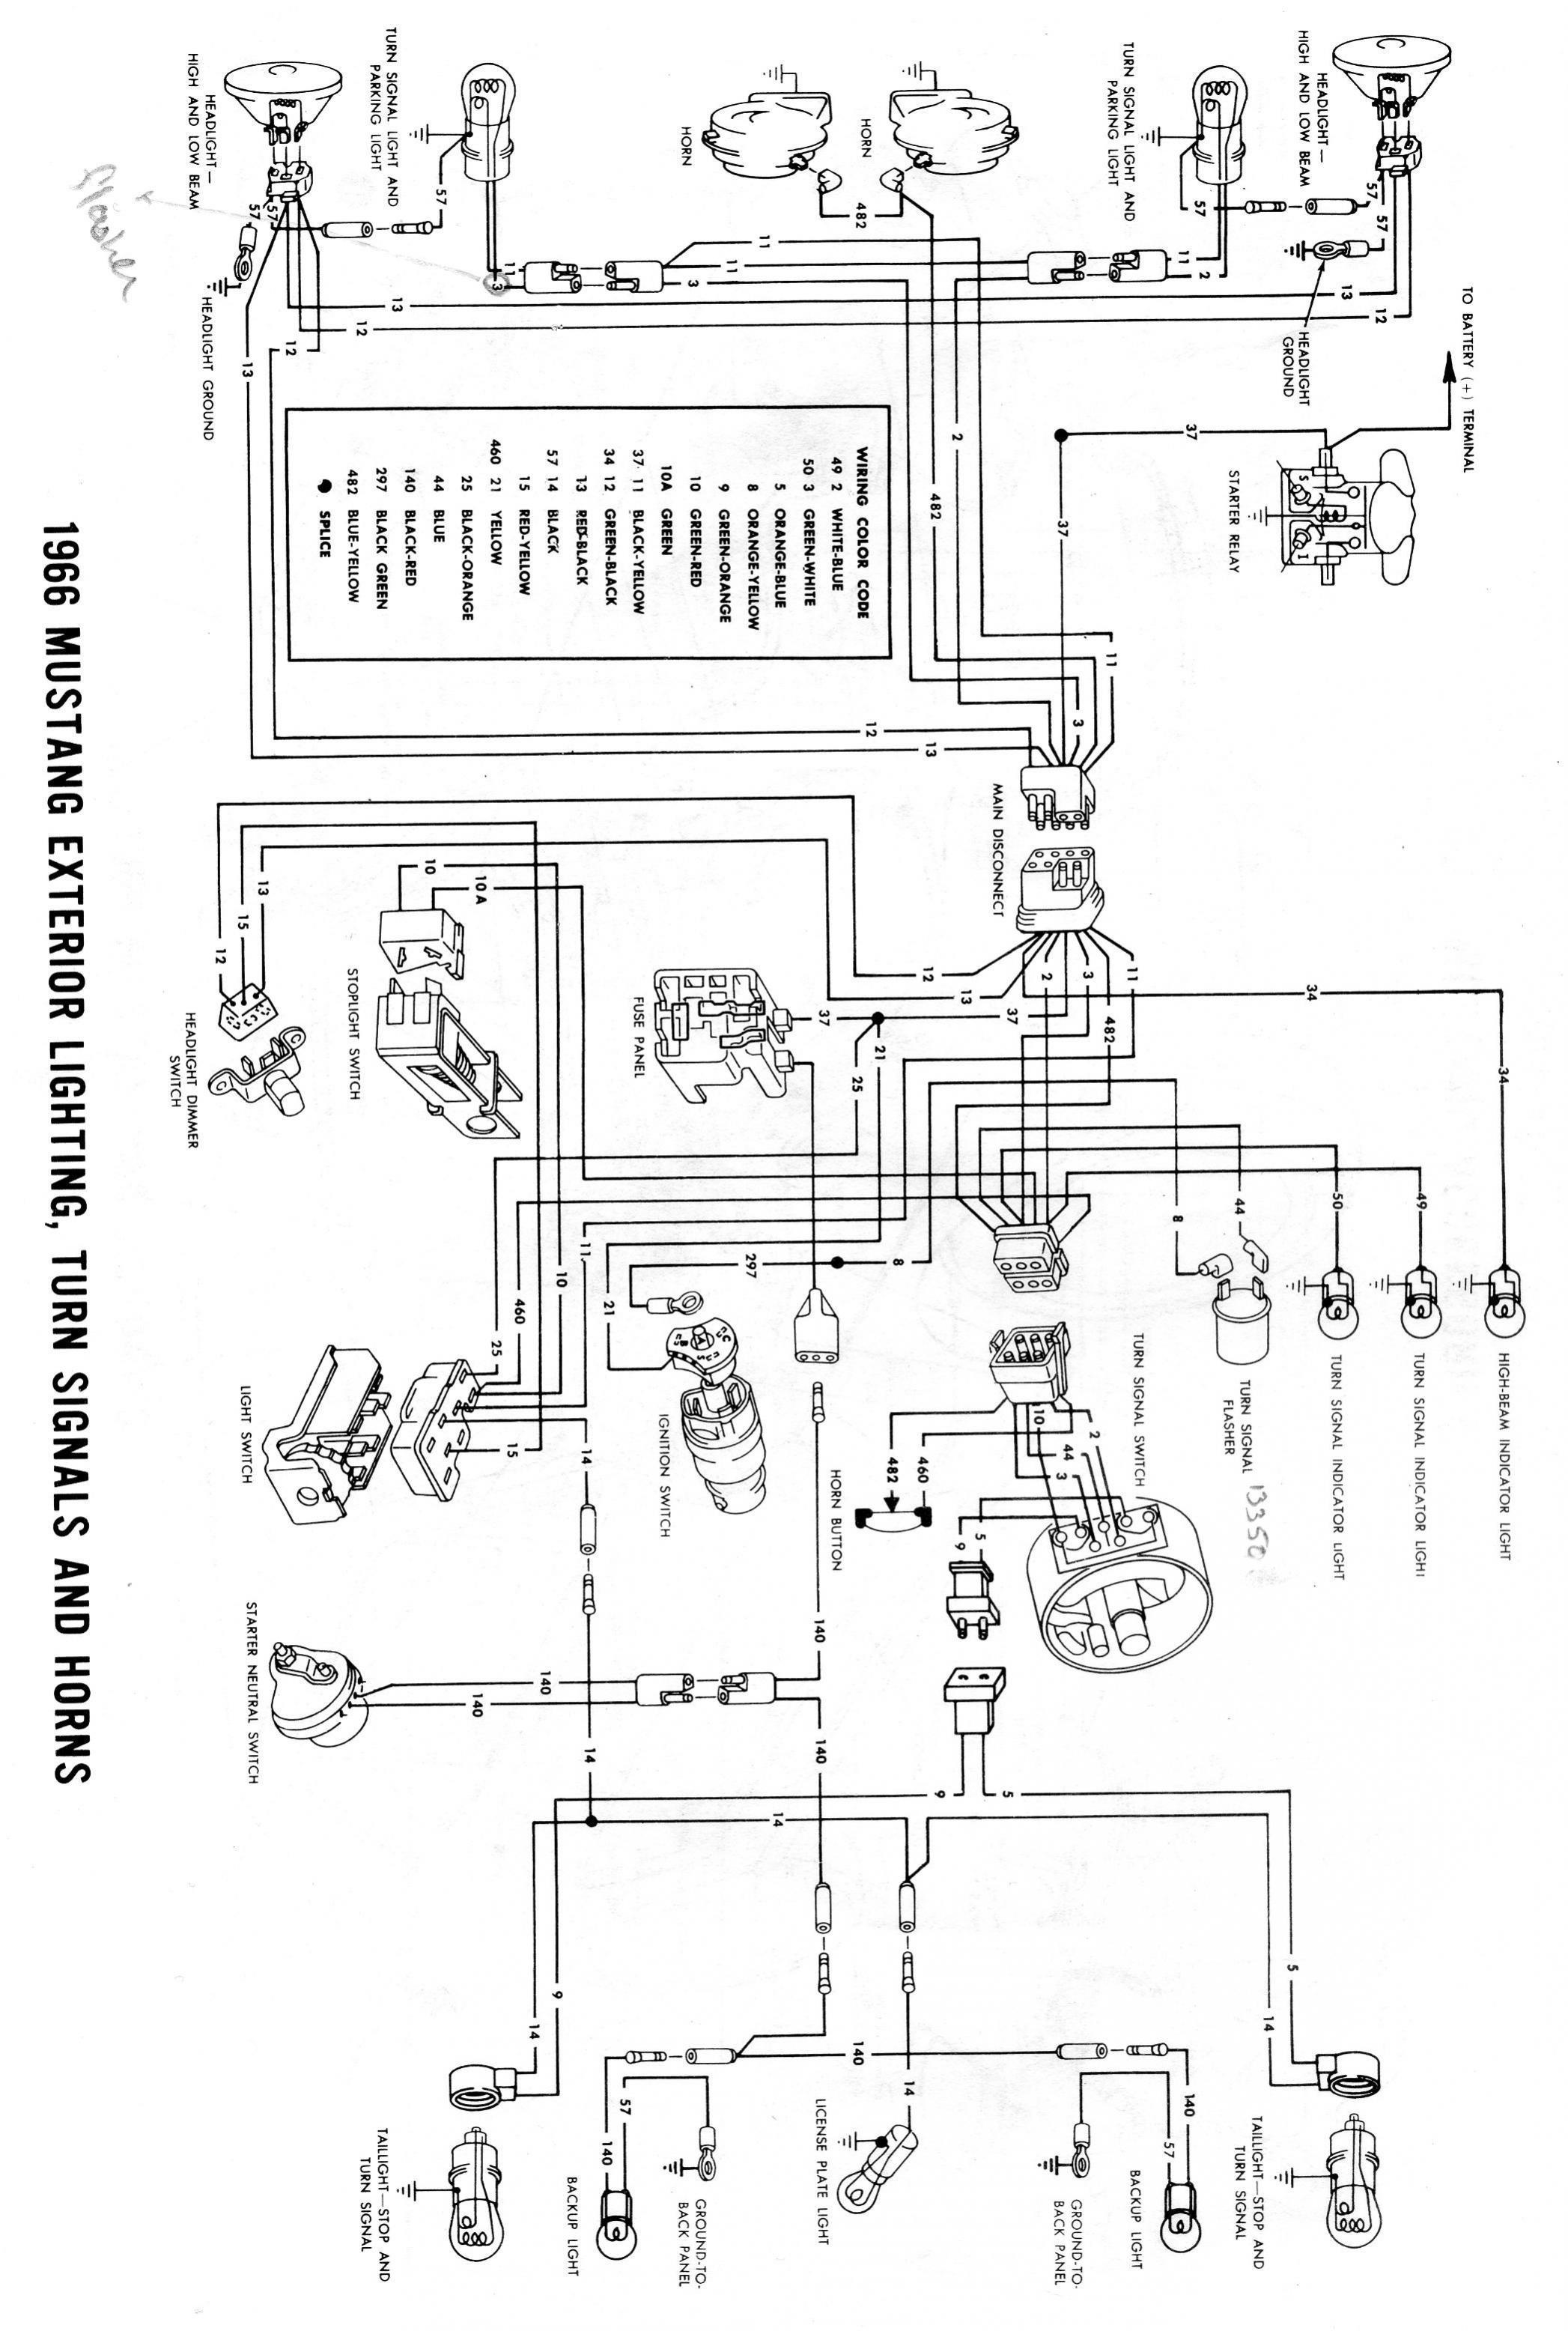 1966 Mustang Wiring Diagram Wiring Diagrams for Turn Signal Save 1966 Mustang Electrical Wiring Of 1966 Mustang Wiring Diagram